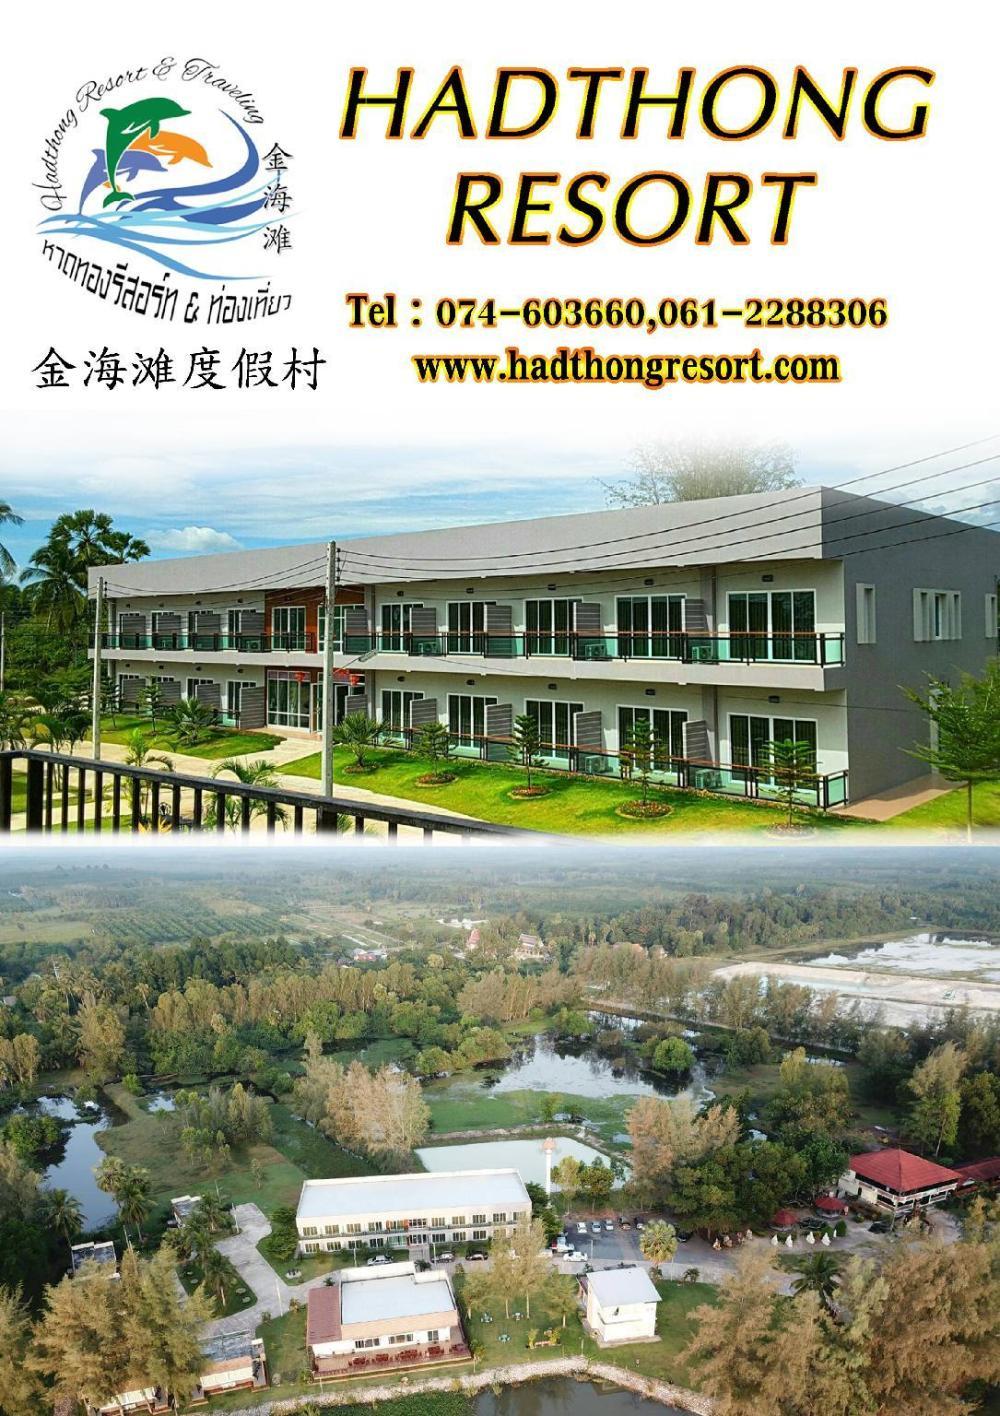 Hadthong Resort